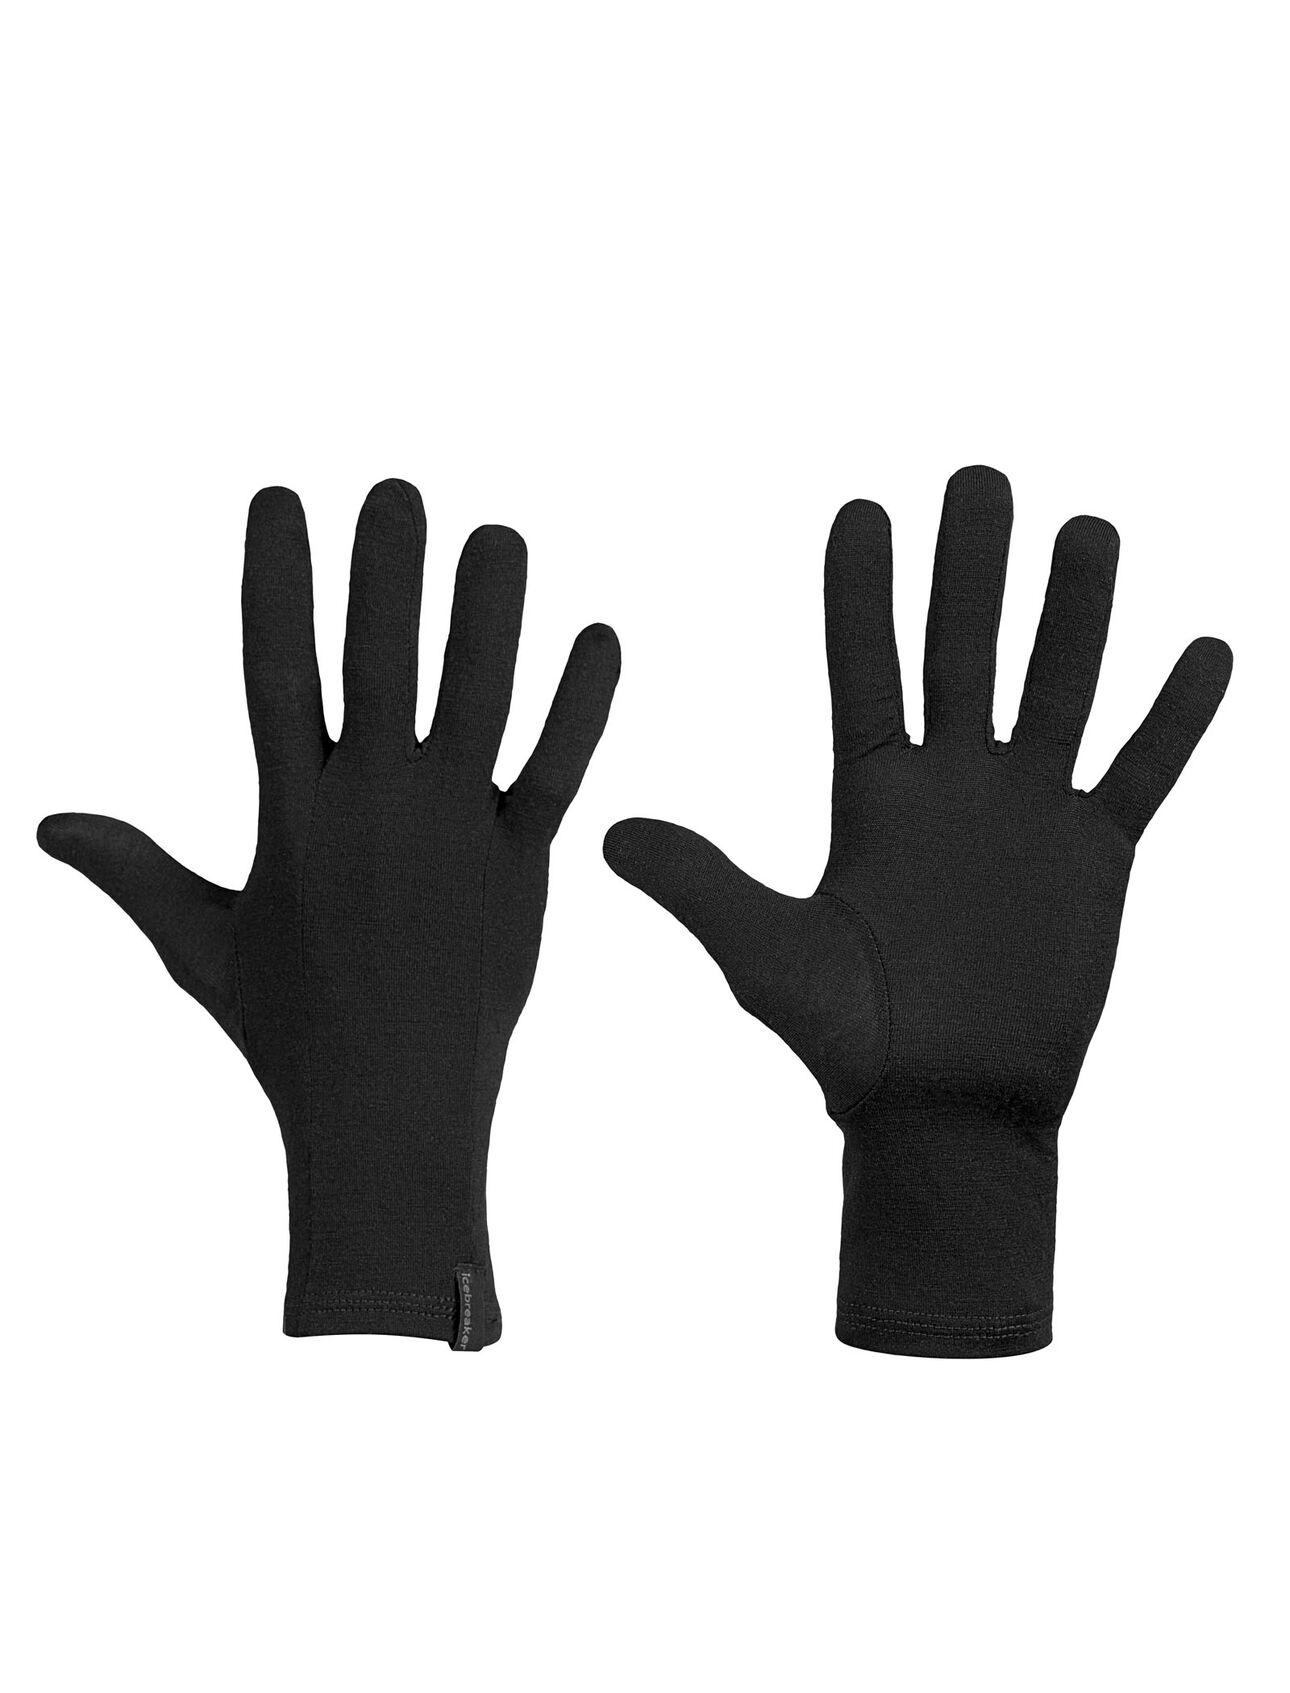 Merino 200 Oasis Glove Liners